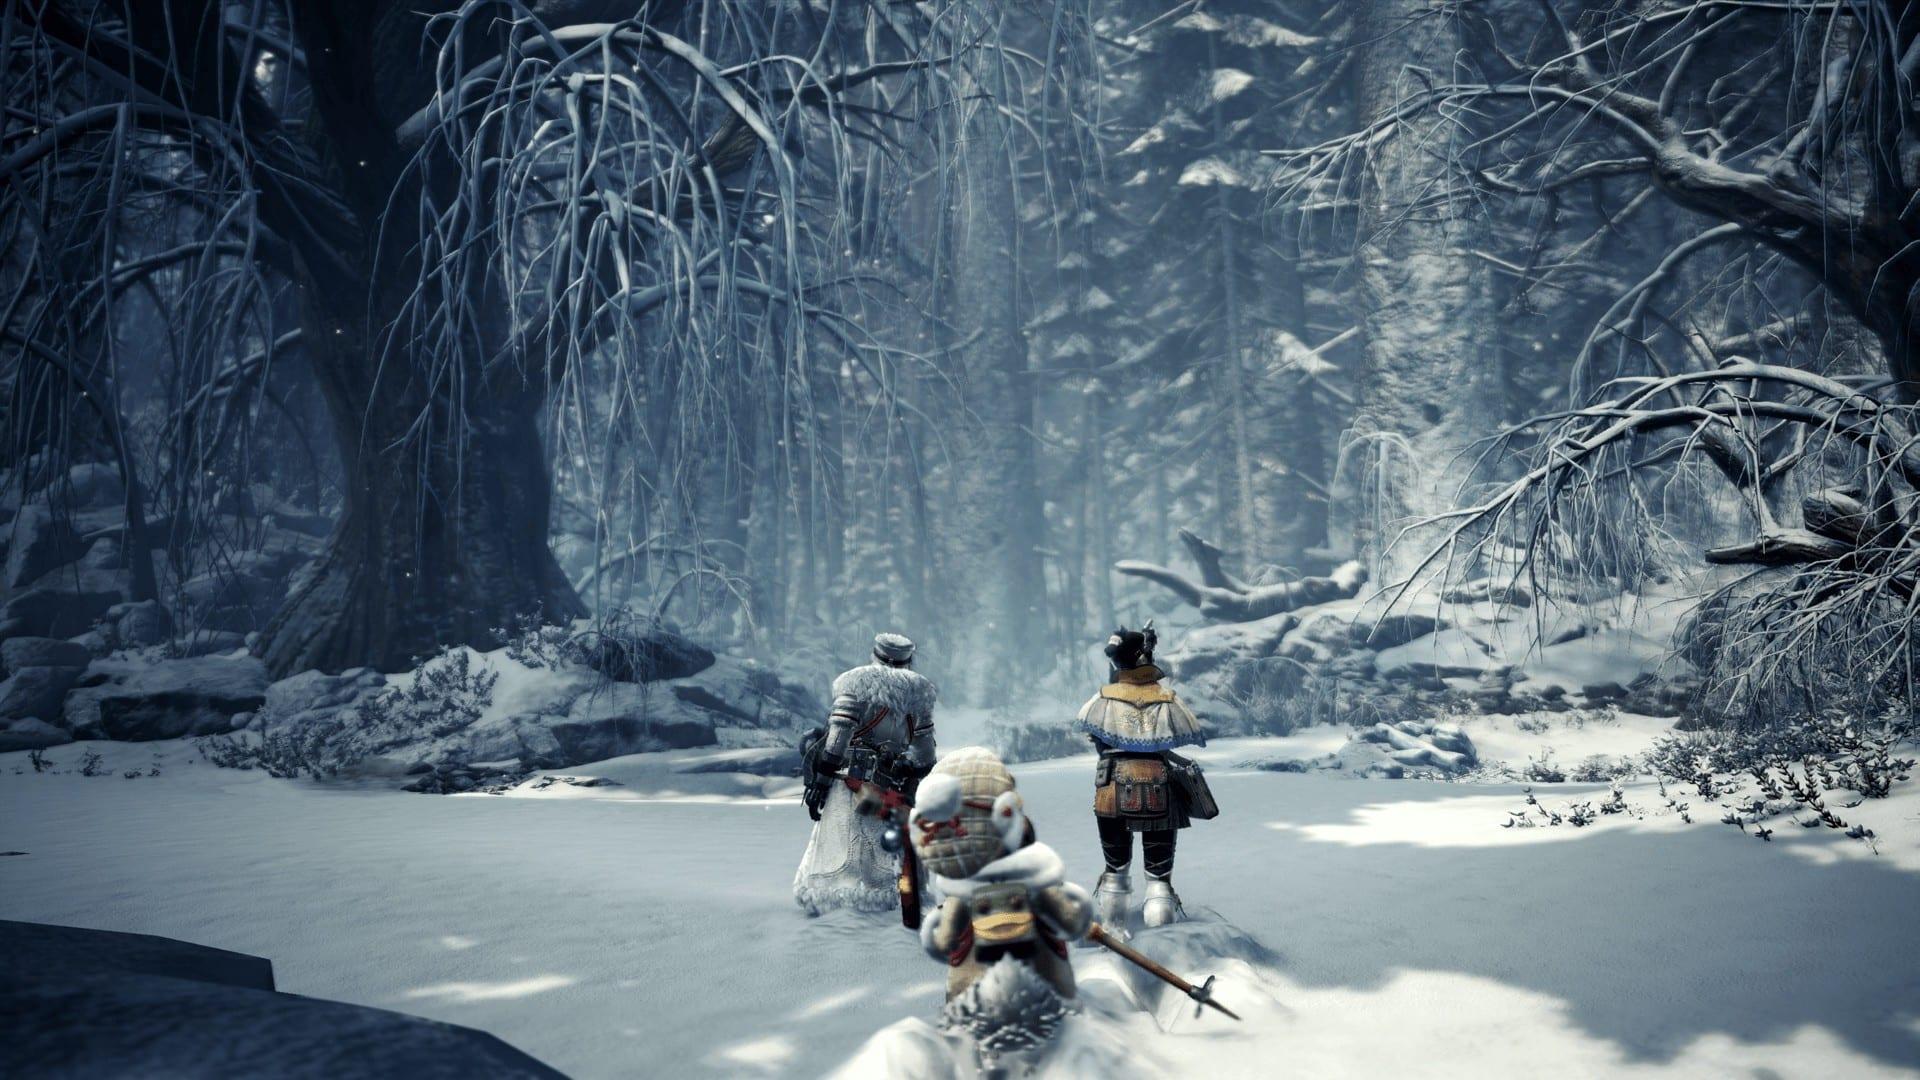 monster hunter world iceborne expansion, is it free